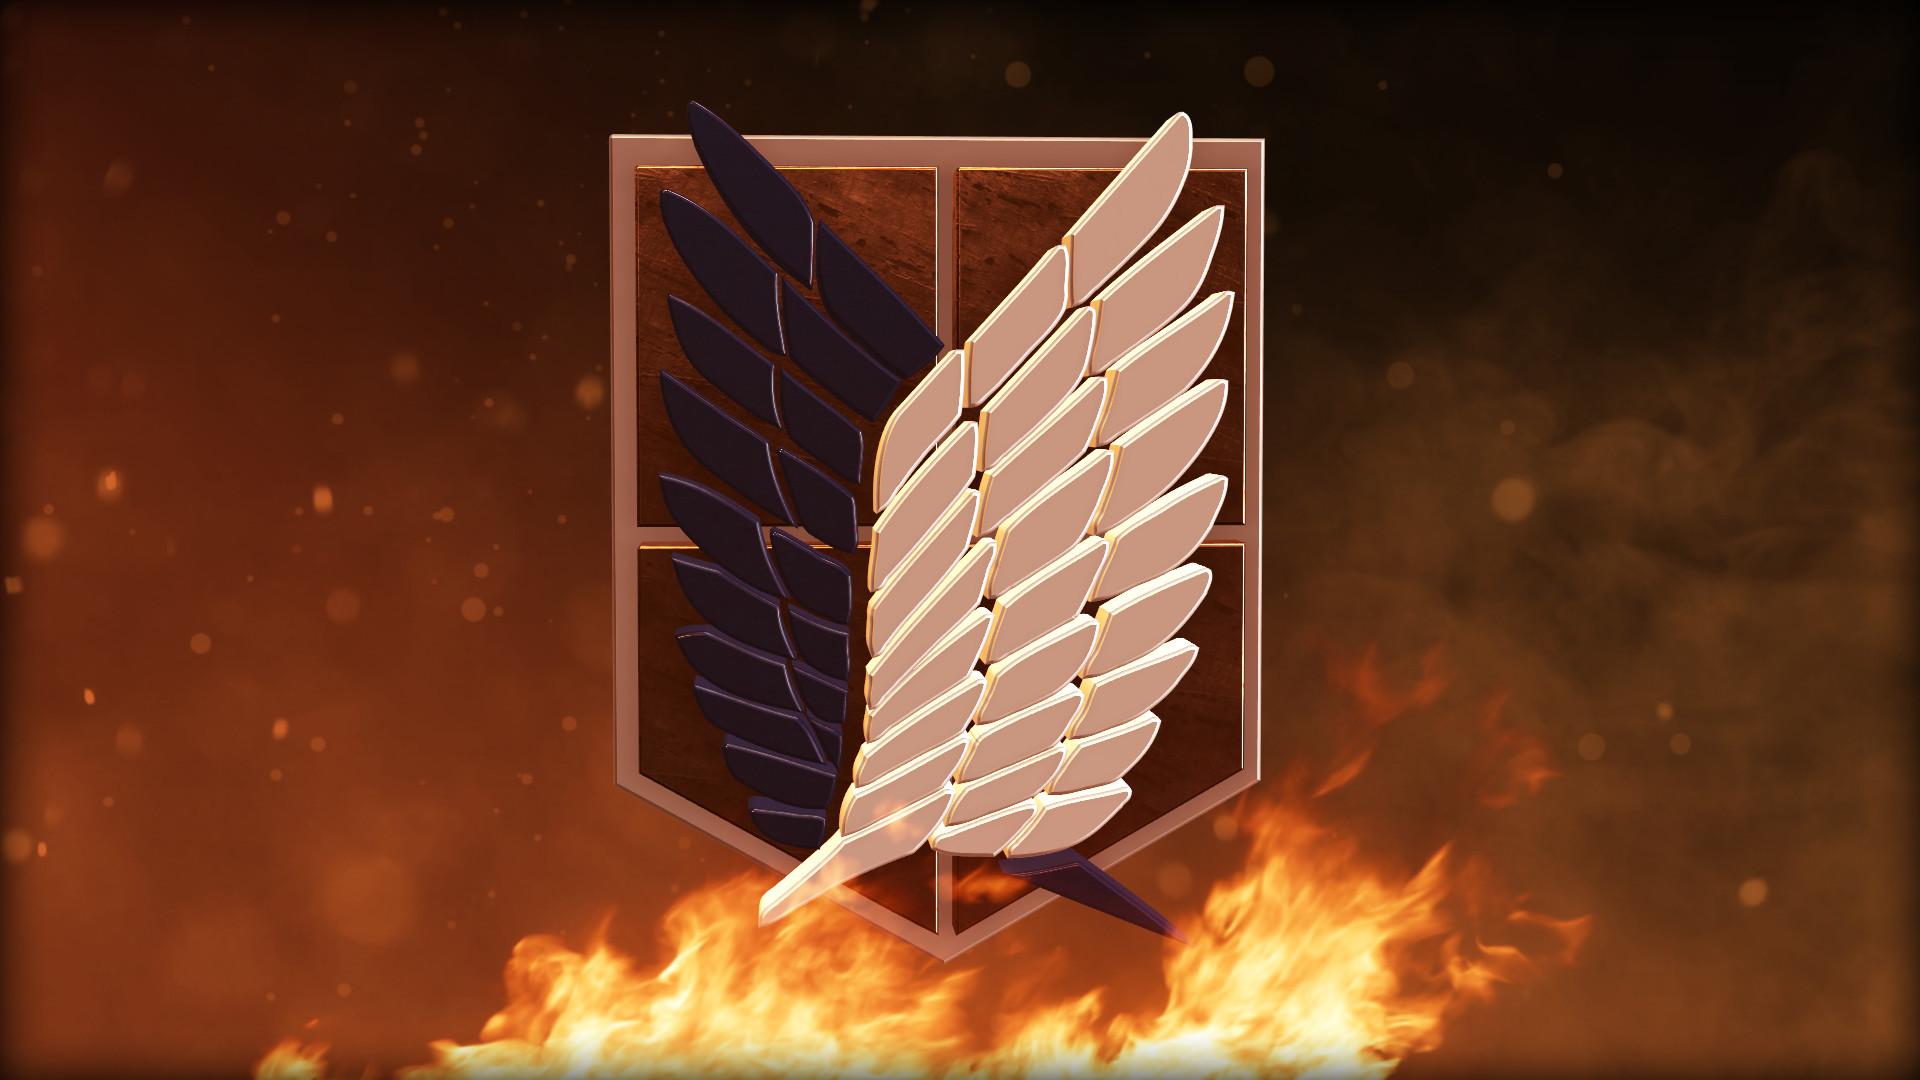 HD Wallpaper   Background ID:505616. Anime Attack On Titan